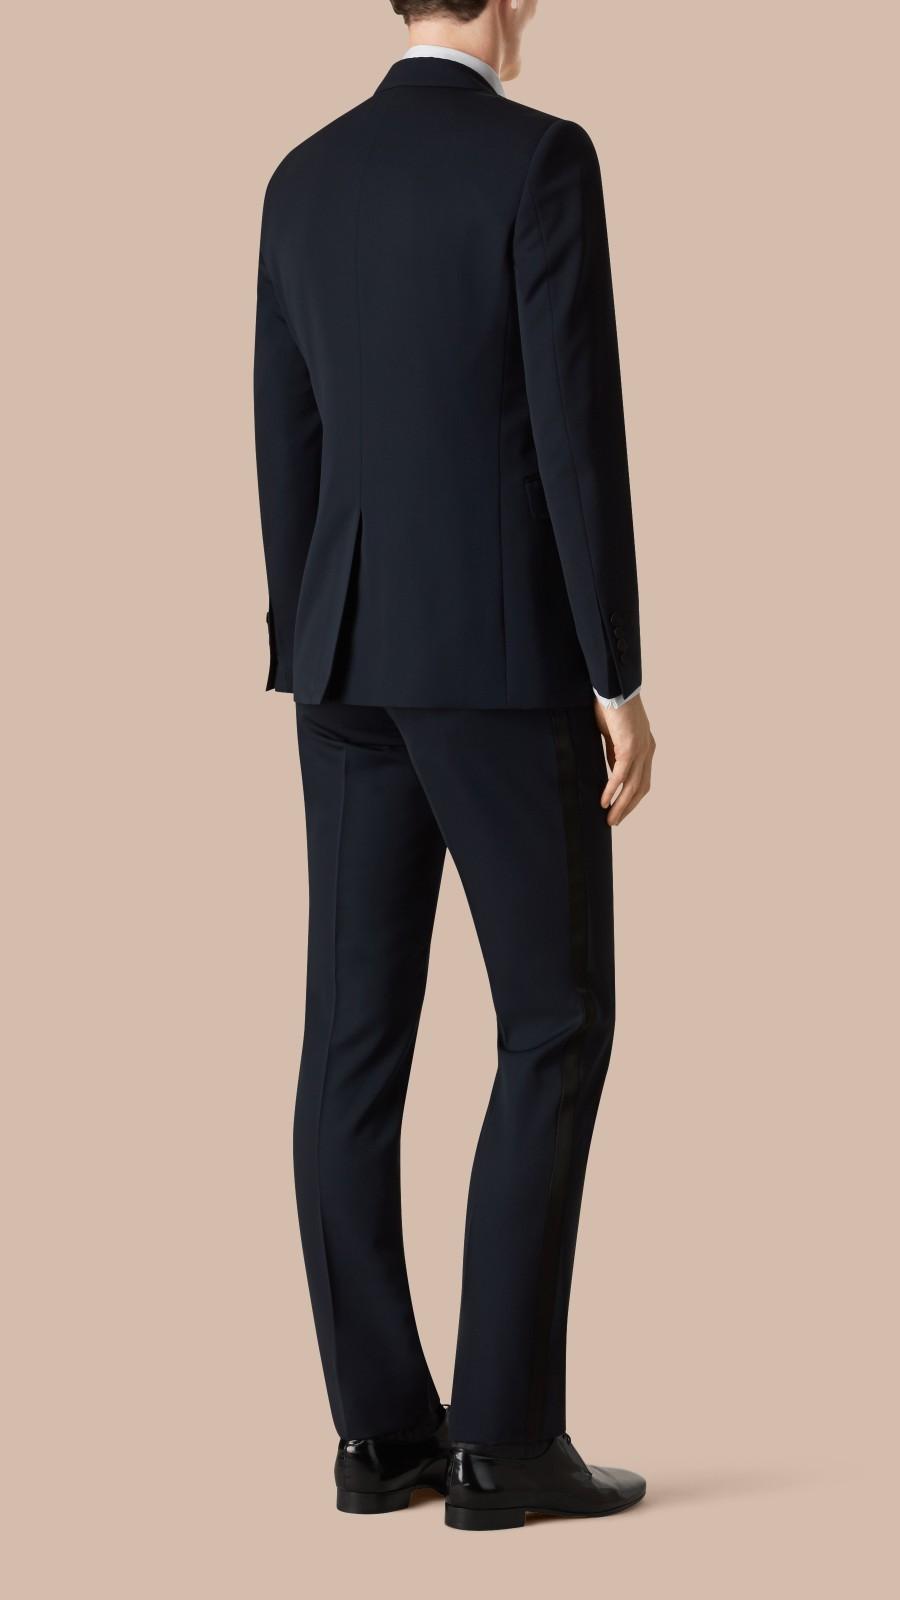 Navy Modern Fit Virgin Wool Half-canvas Tuxedo - Image 3